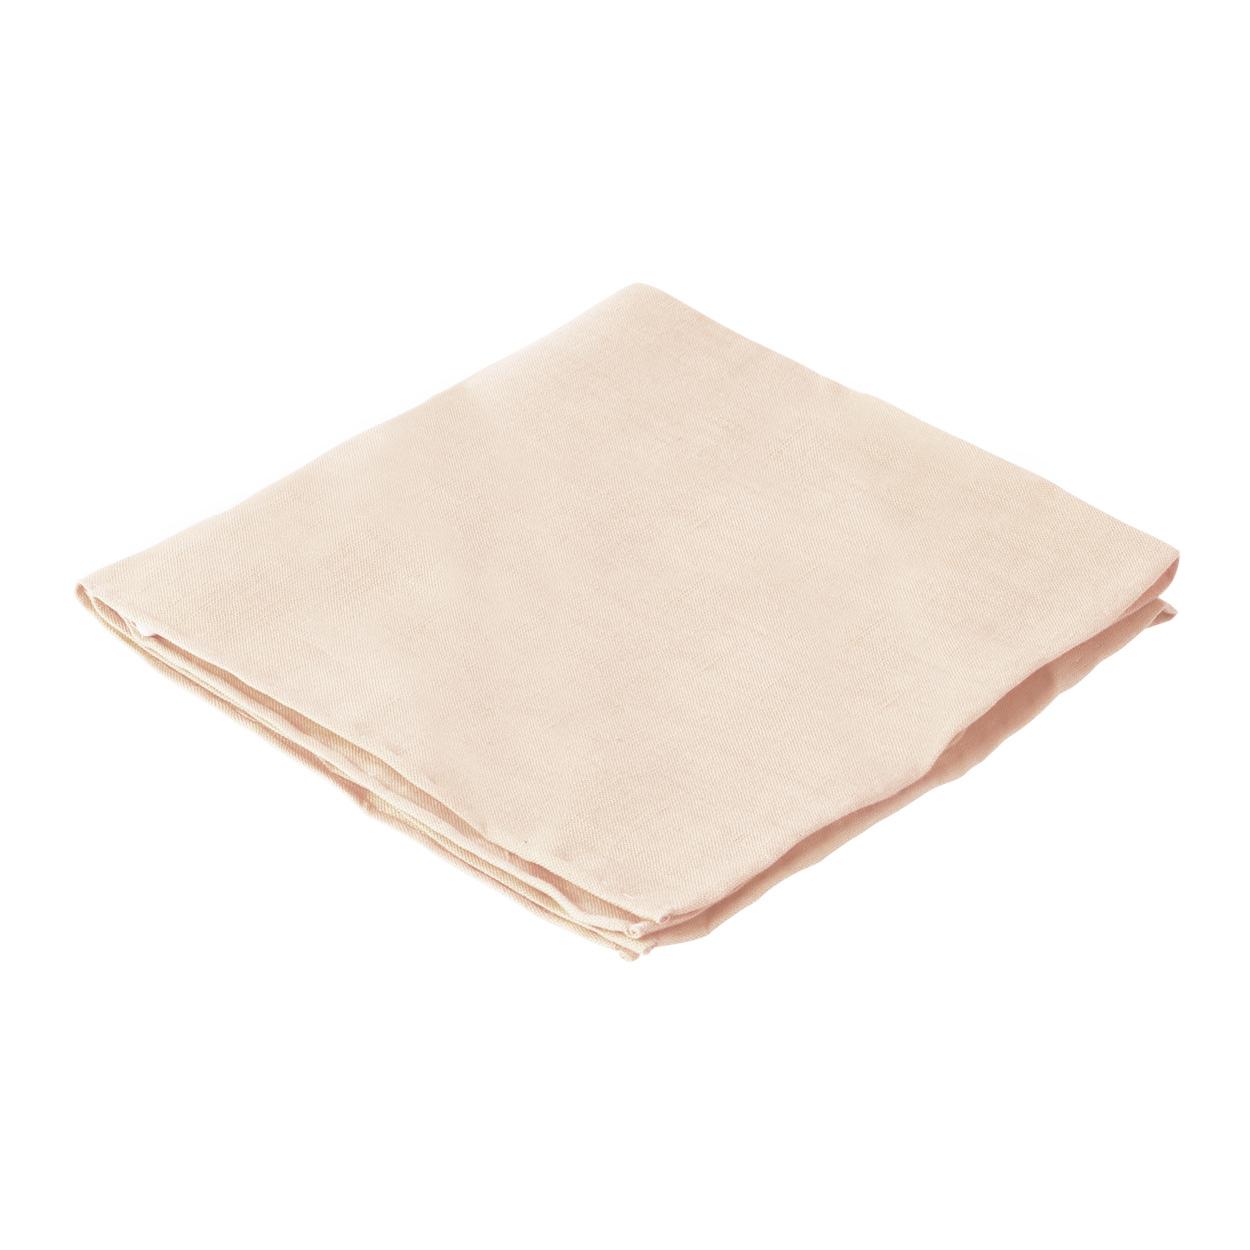 Jacob-Alexander-Linen-Handrolled-15-034-x-15-034-Pocket-Square-Hanky thumbnail 22